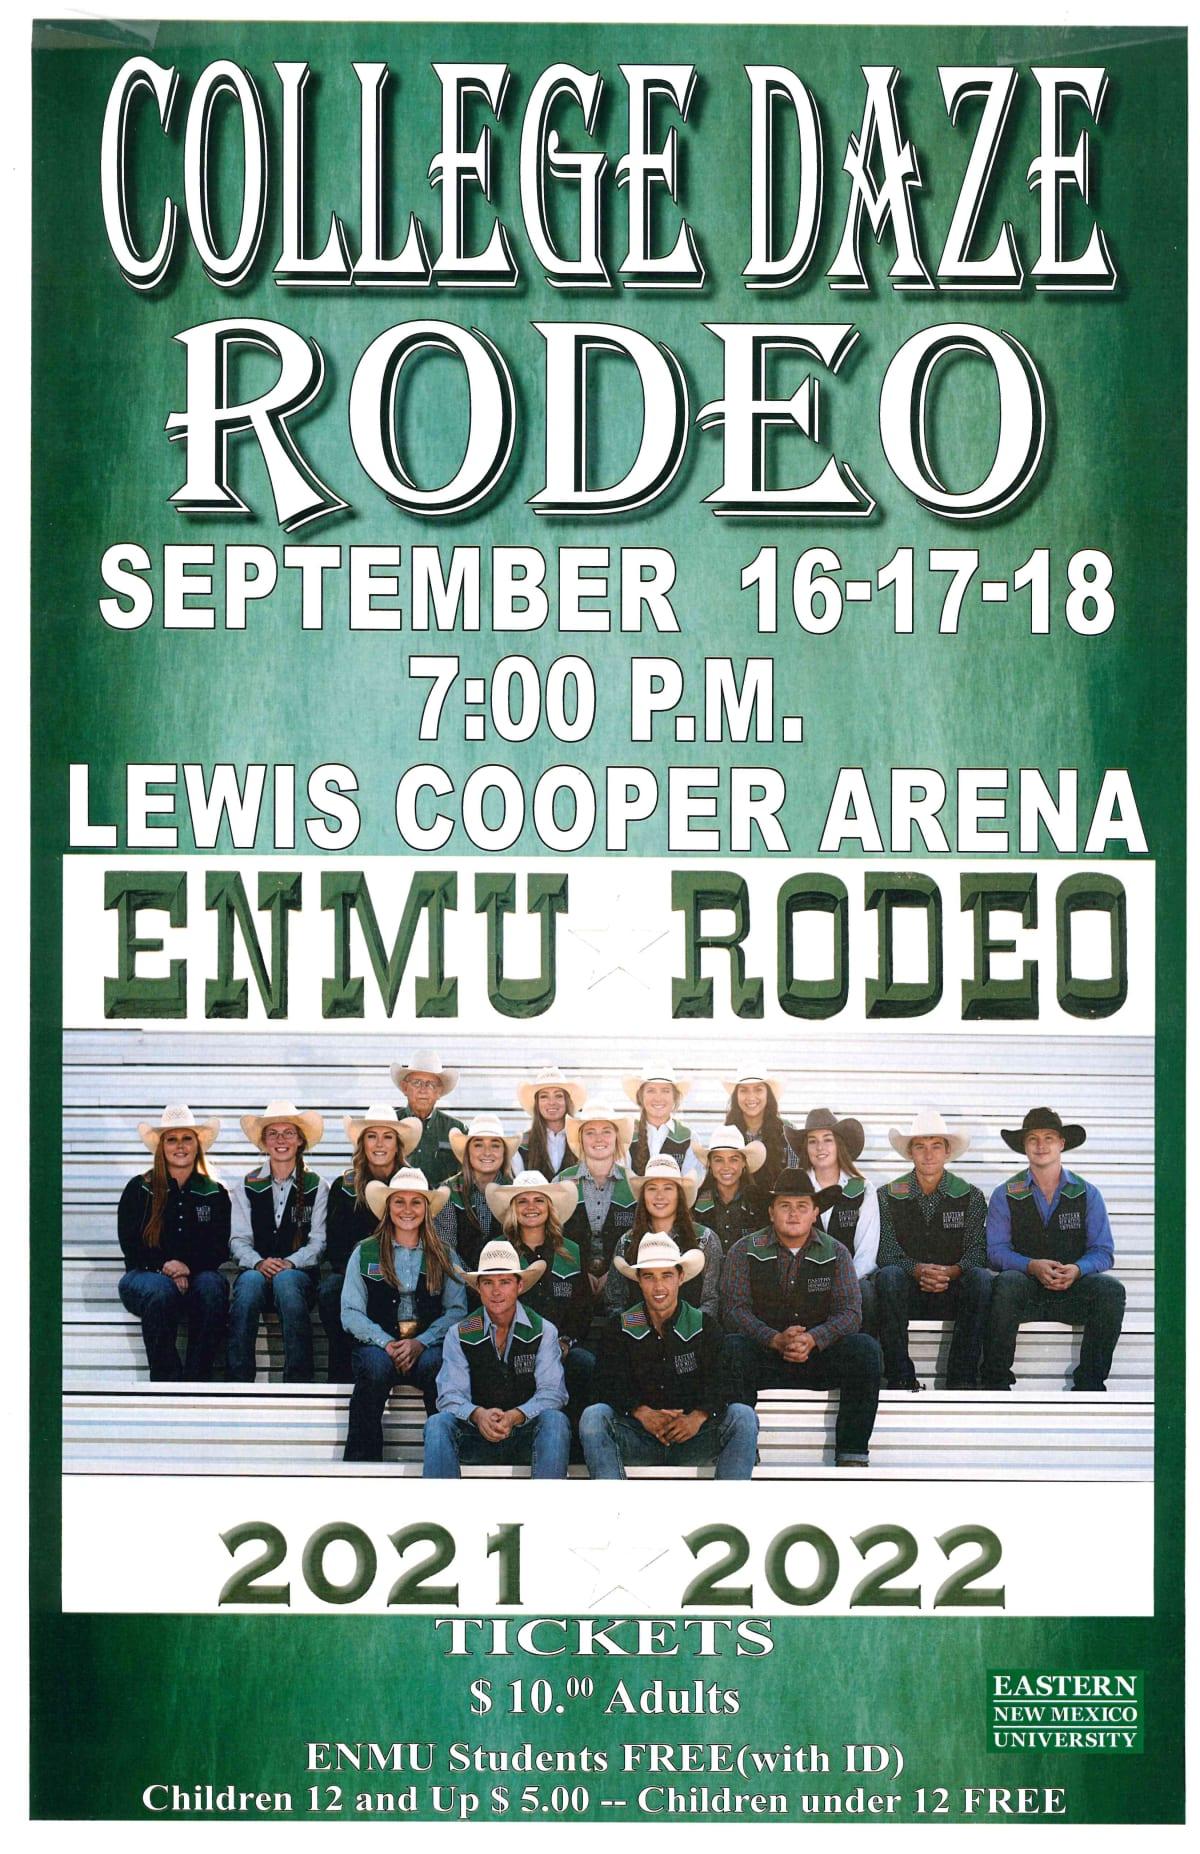 College-Daze-Rodeo-w1200.jpg